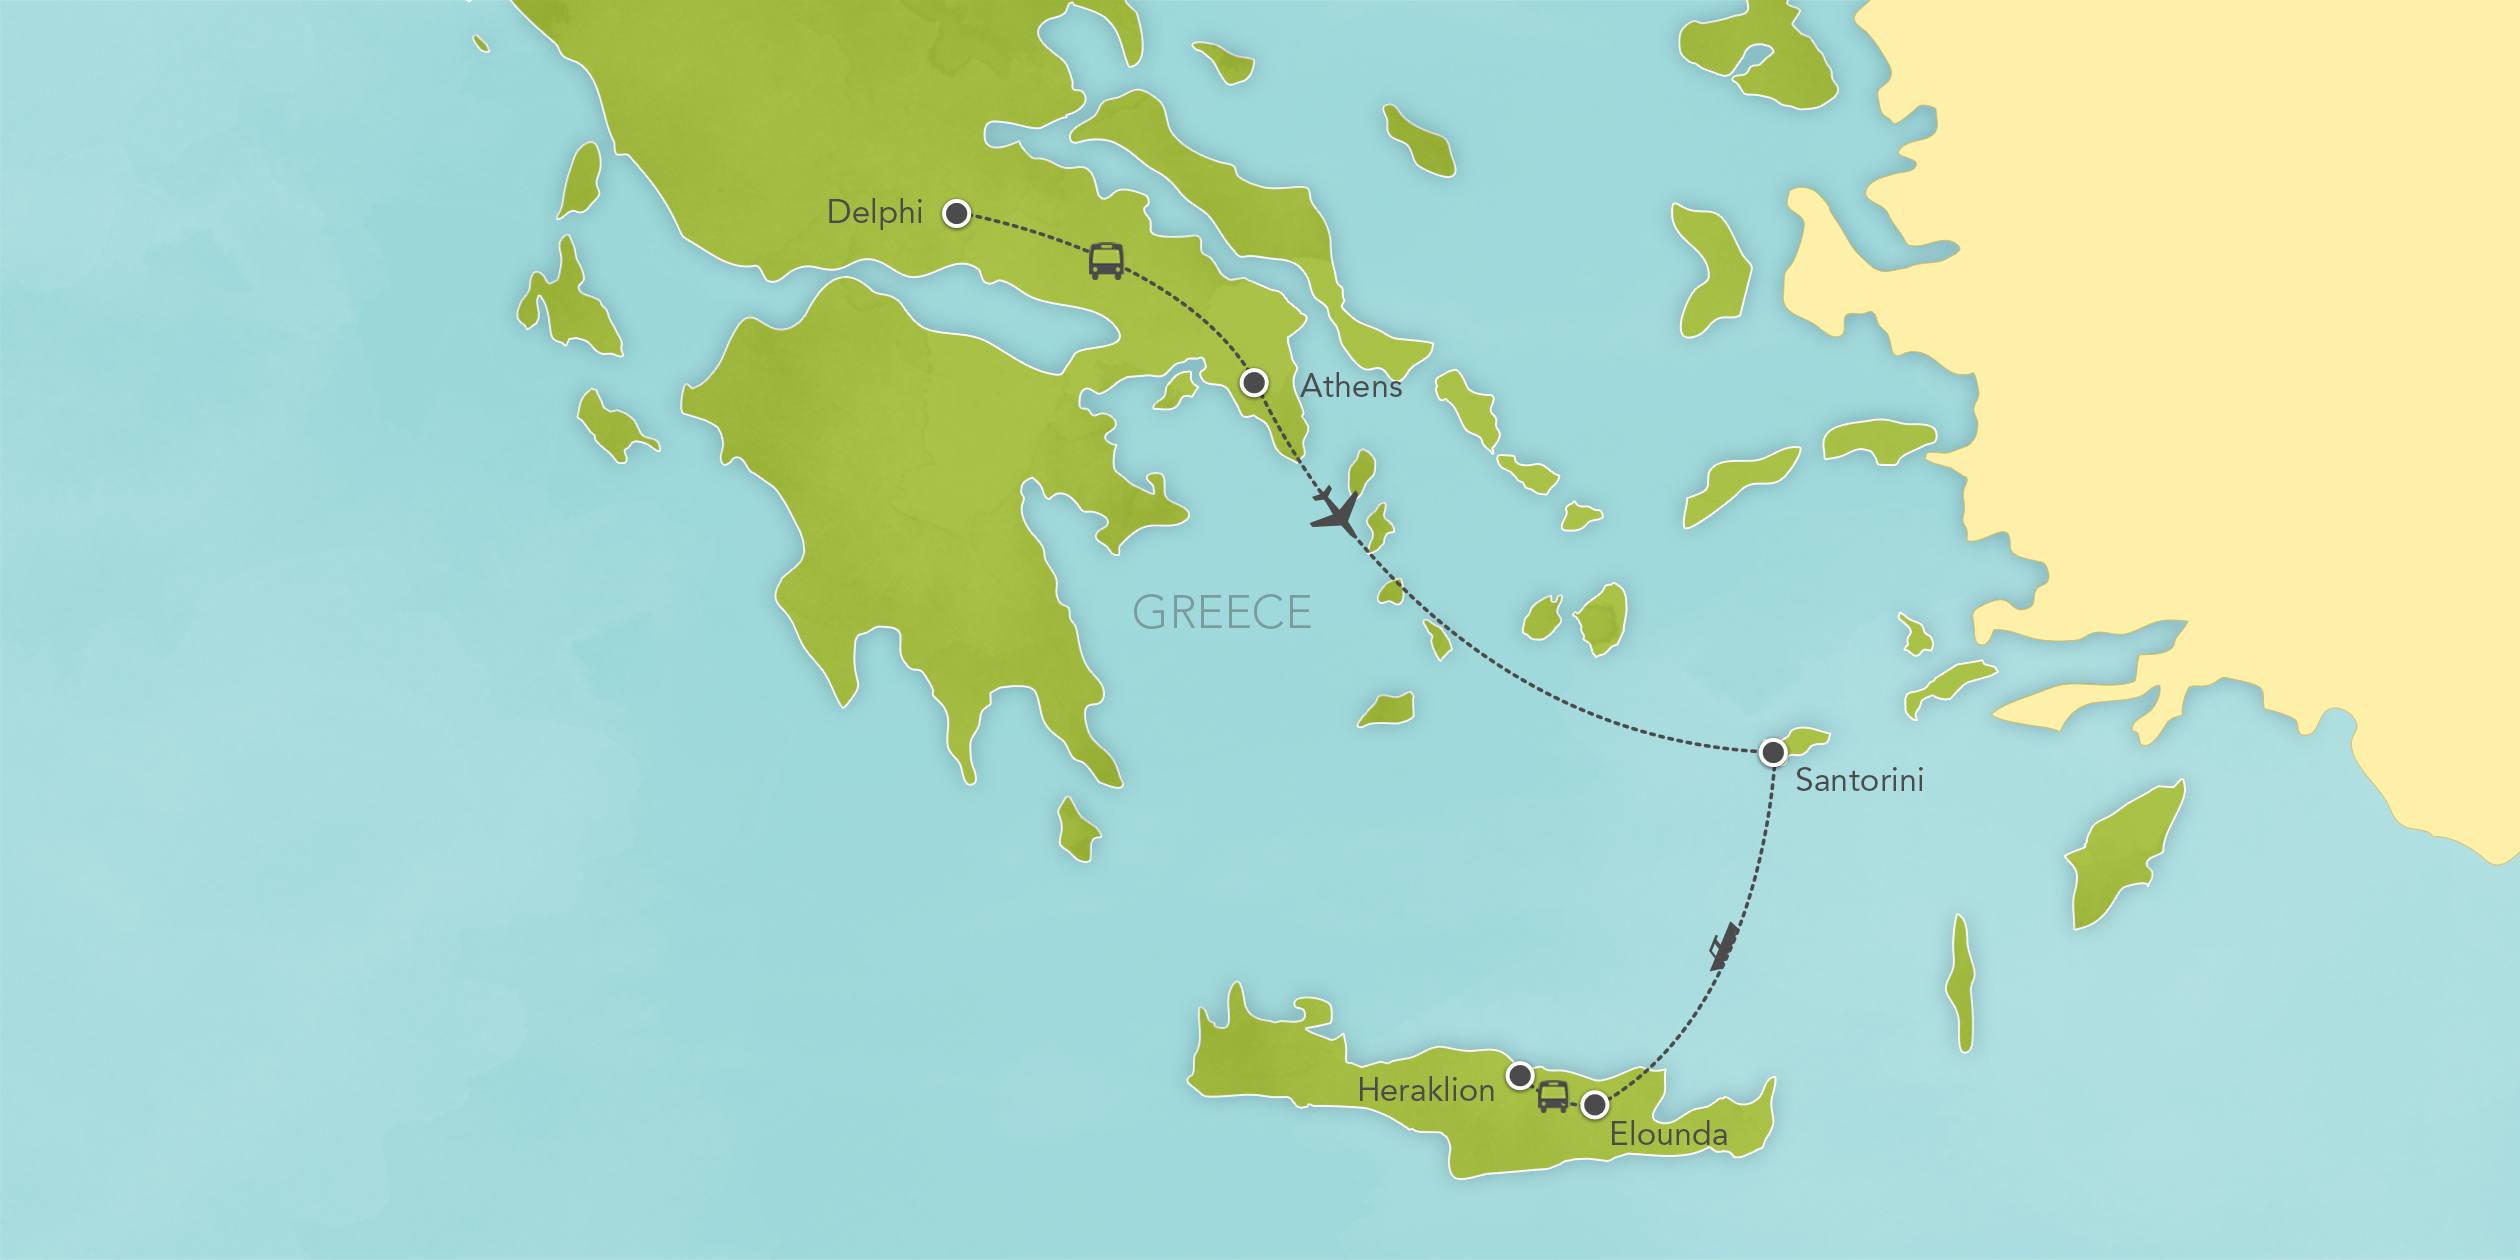 Itinerary map of Greece: Athens, Delphi, Santorini, Crete 2017